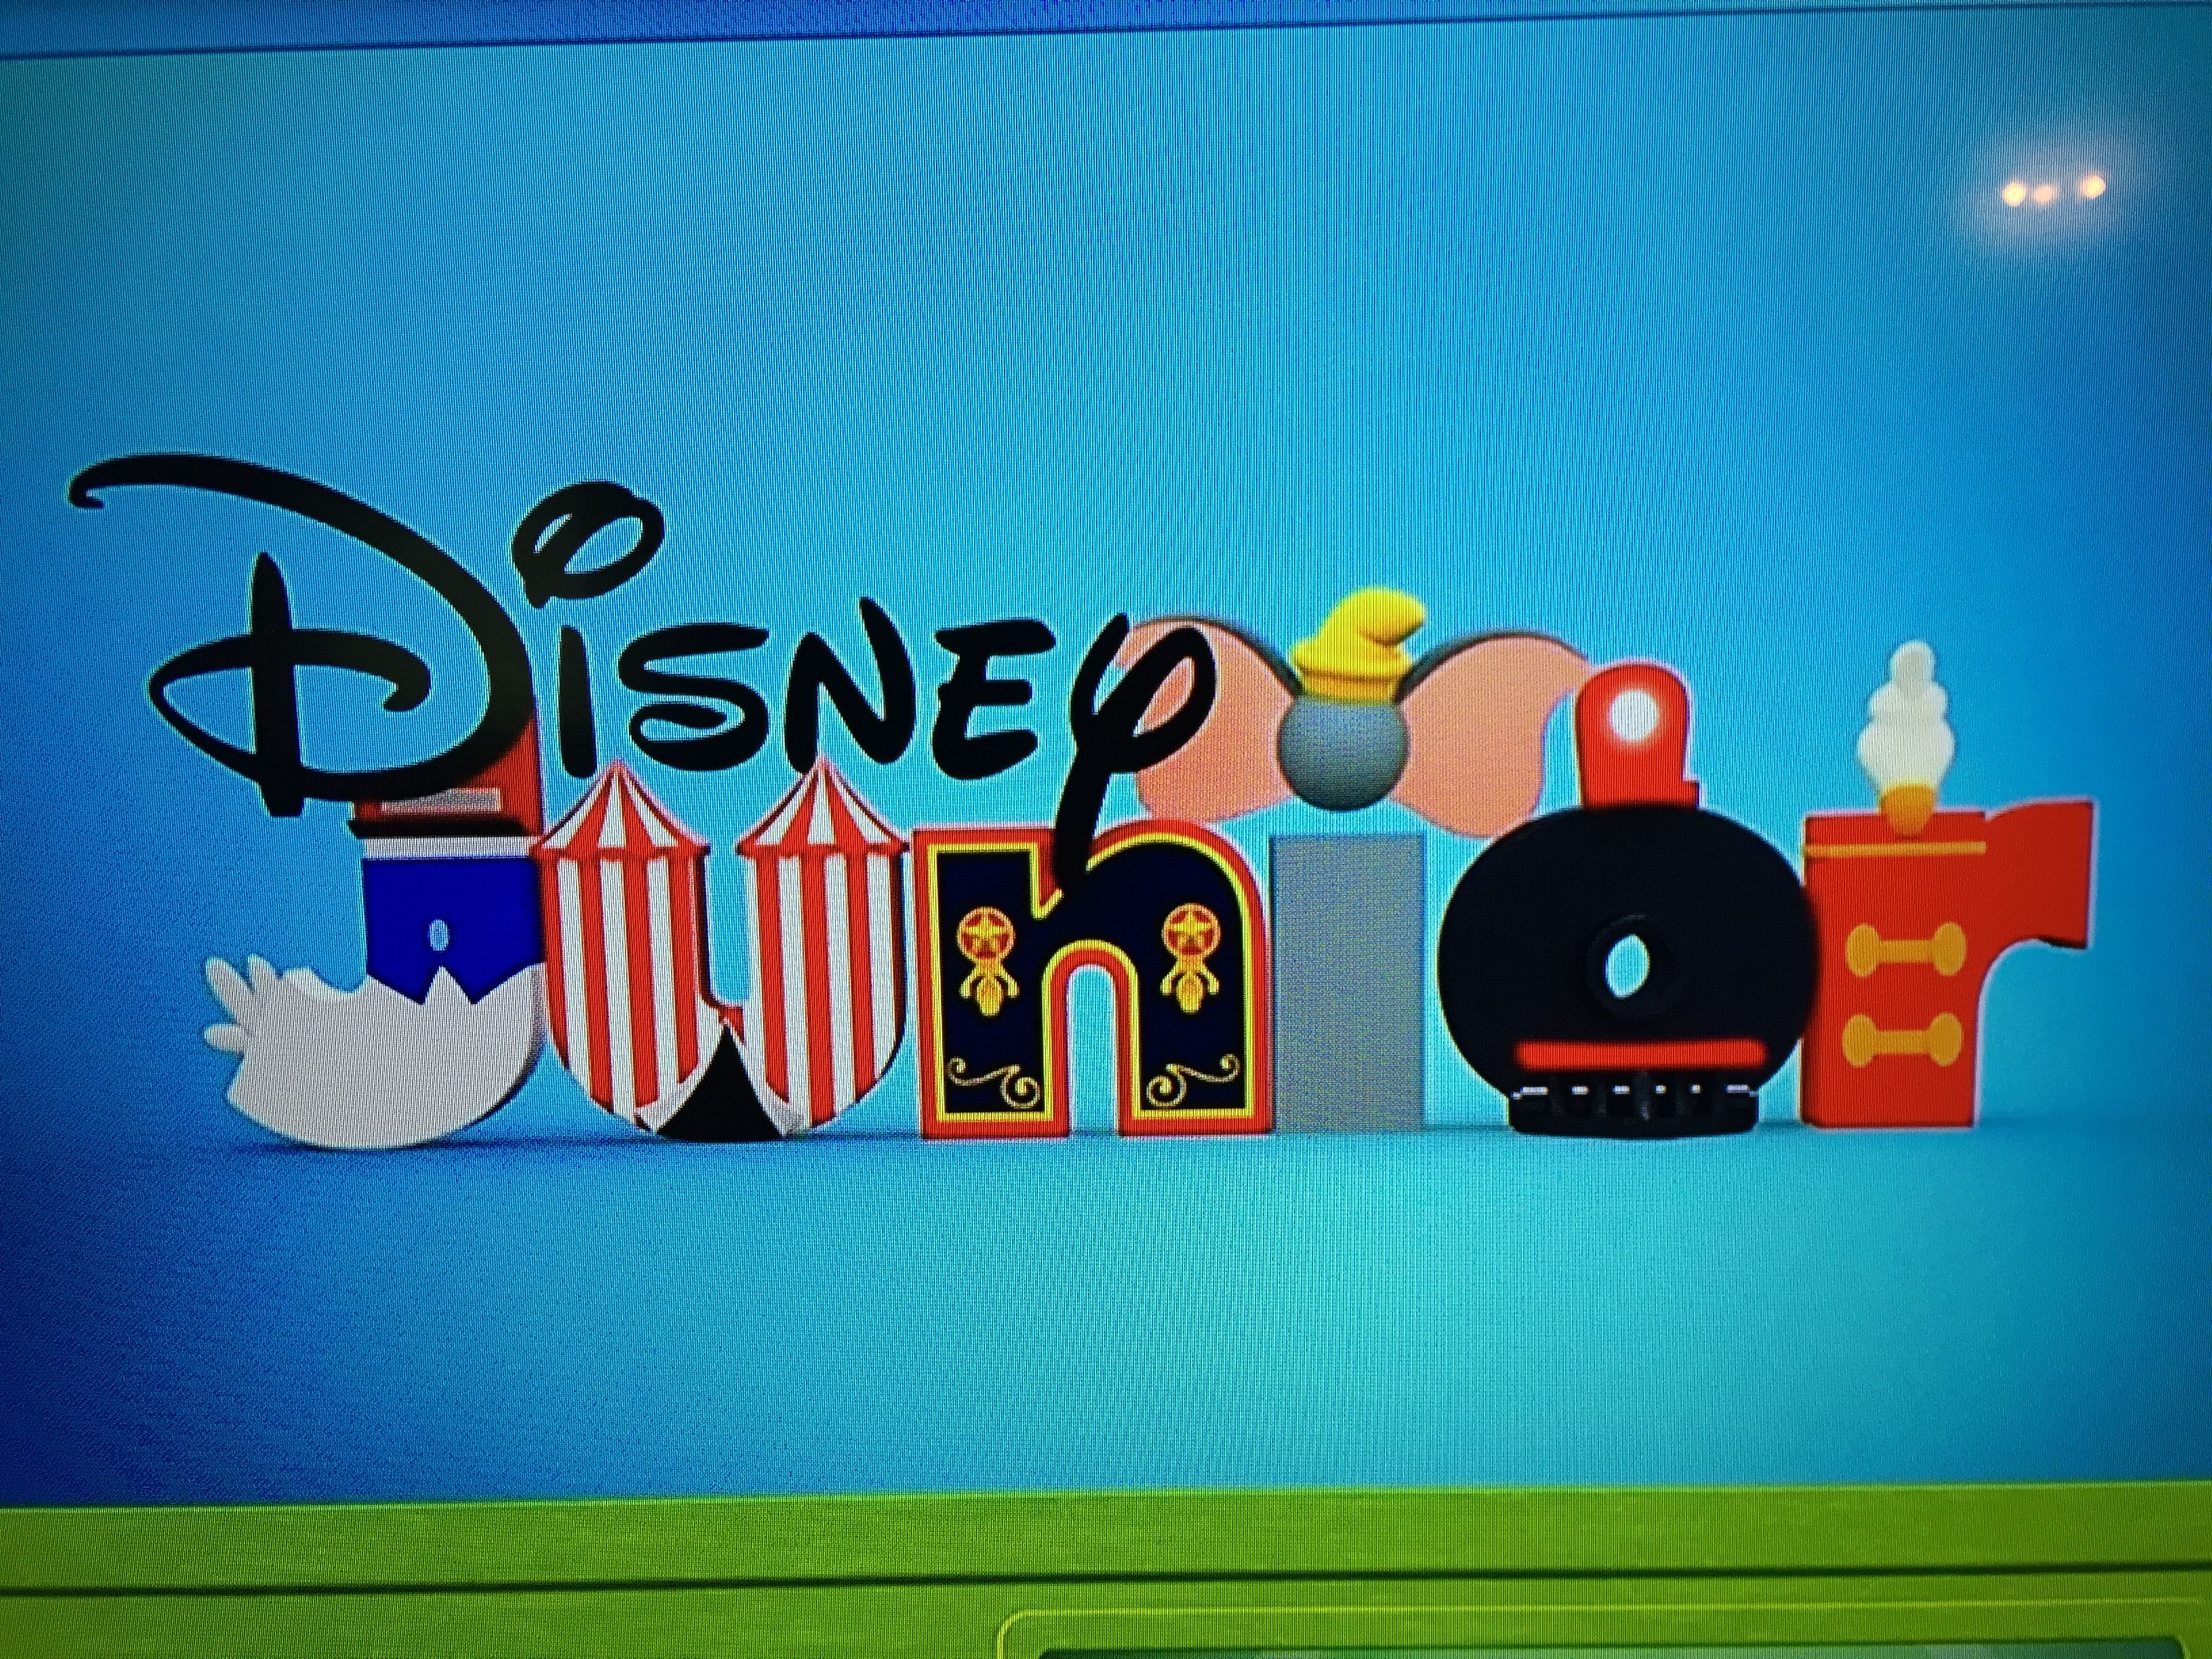 Pin By Ranica Holmgren On Djr Logos Disney Letters Disney Junior 3d Letters